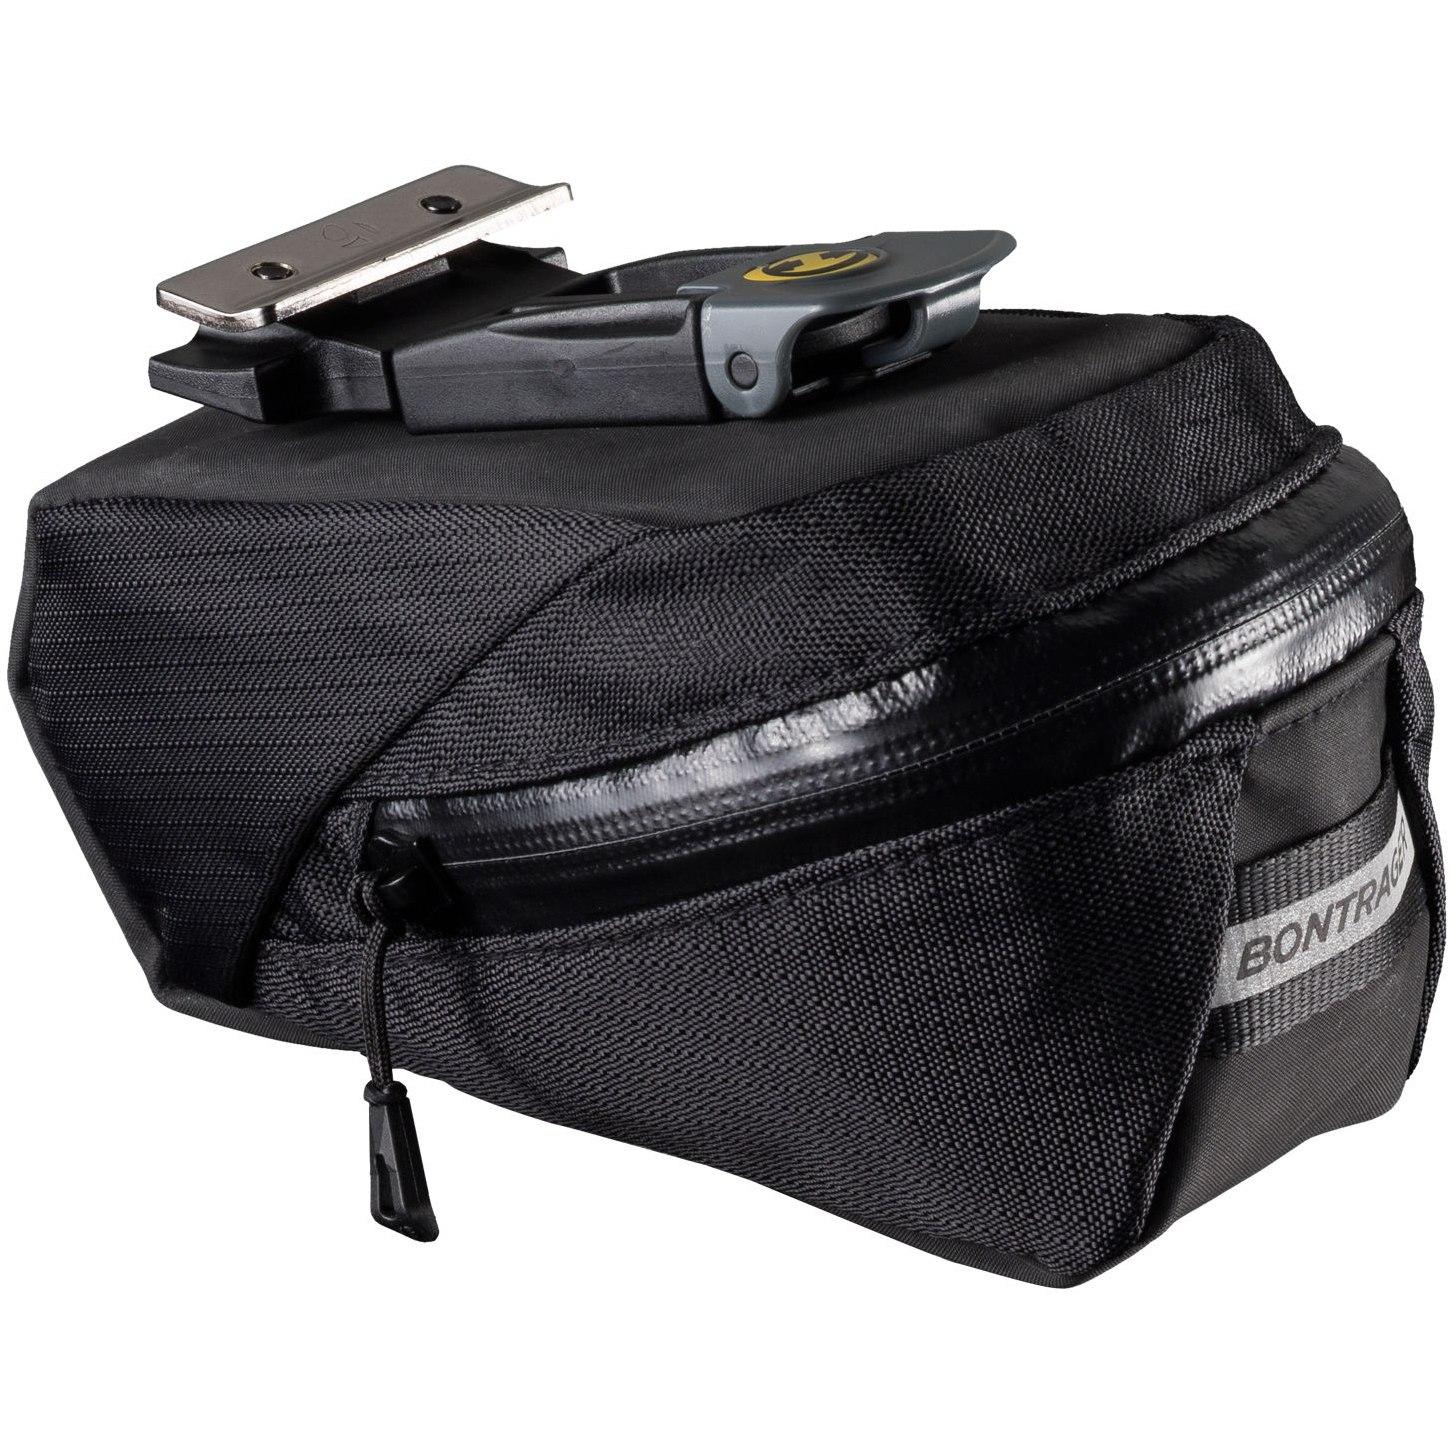 Bontrager Pro Quick Cleat Medium Seat Pack - black